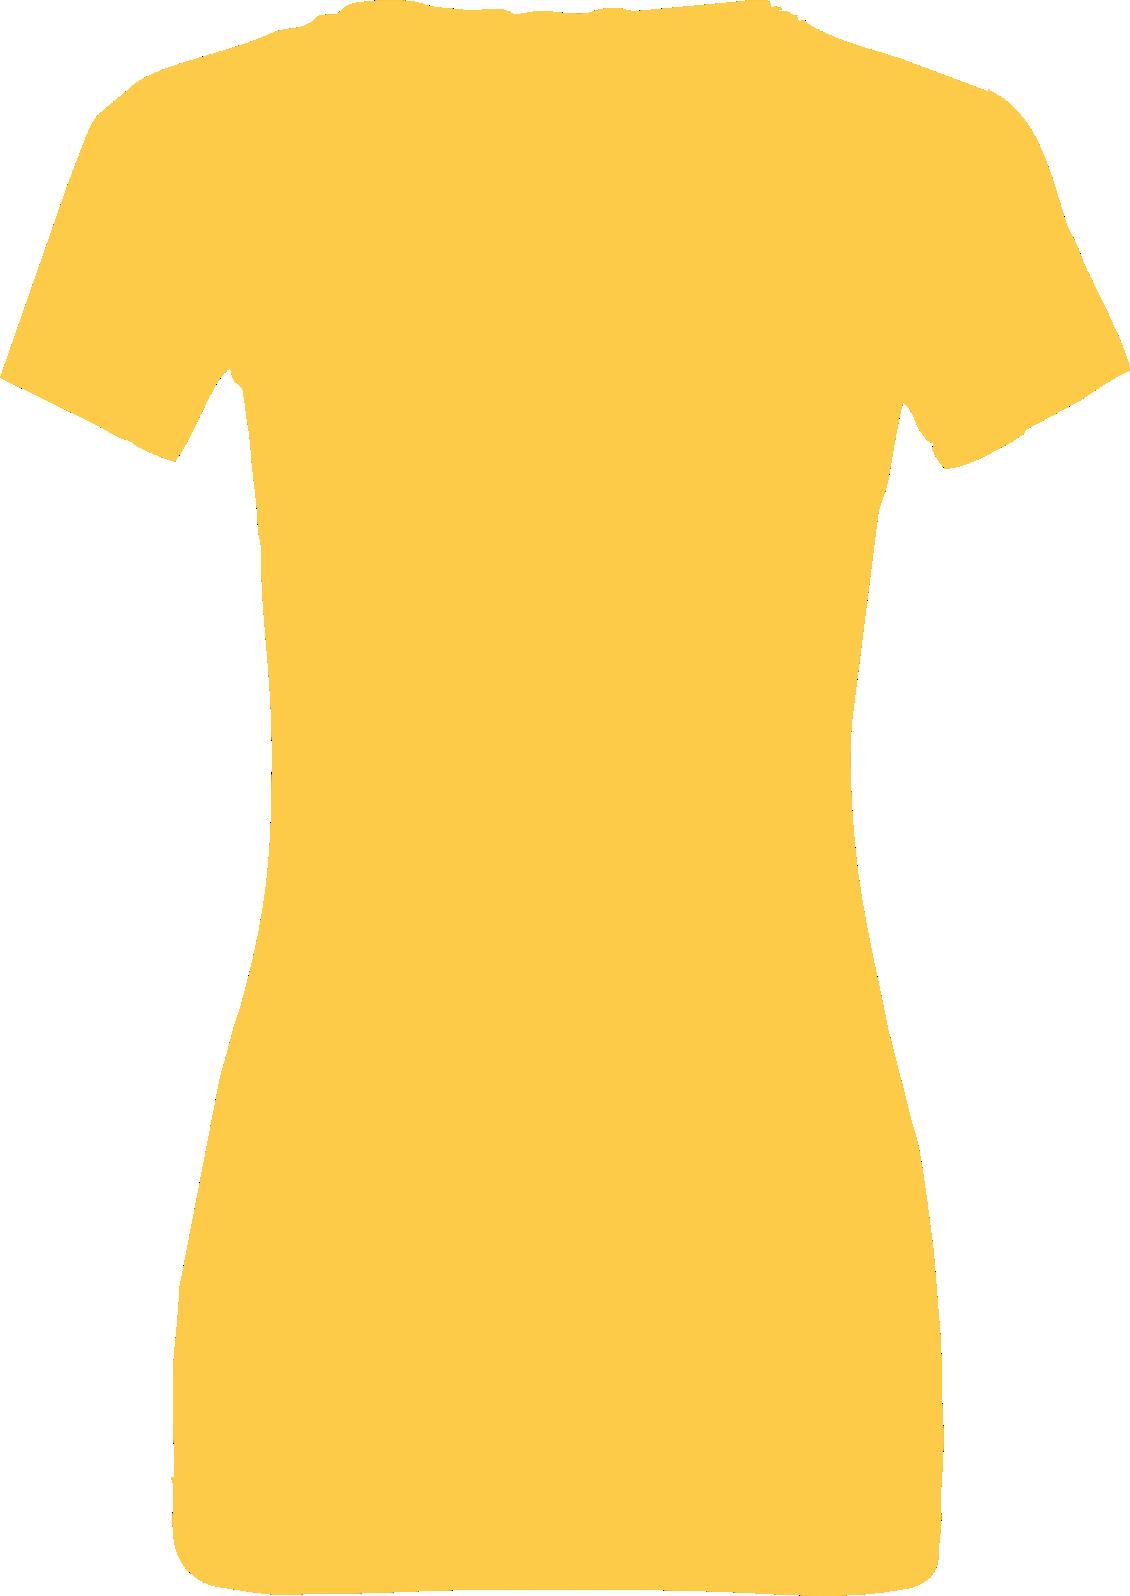 Obrázková trička